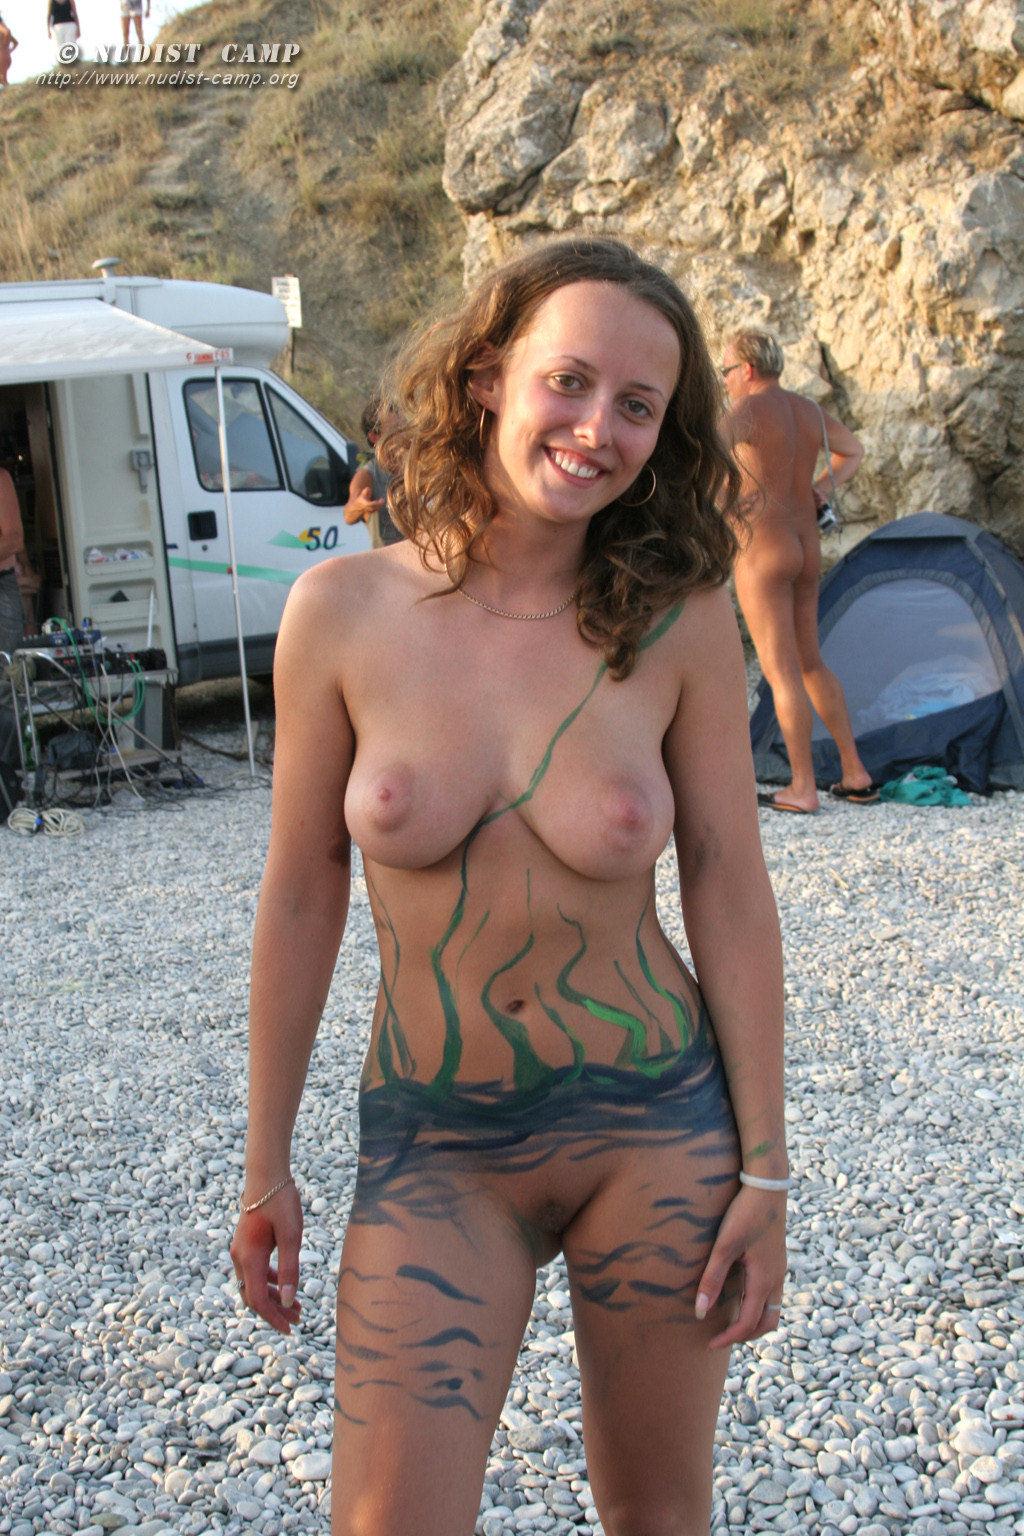 Sorry, Vista nudist camp